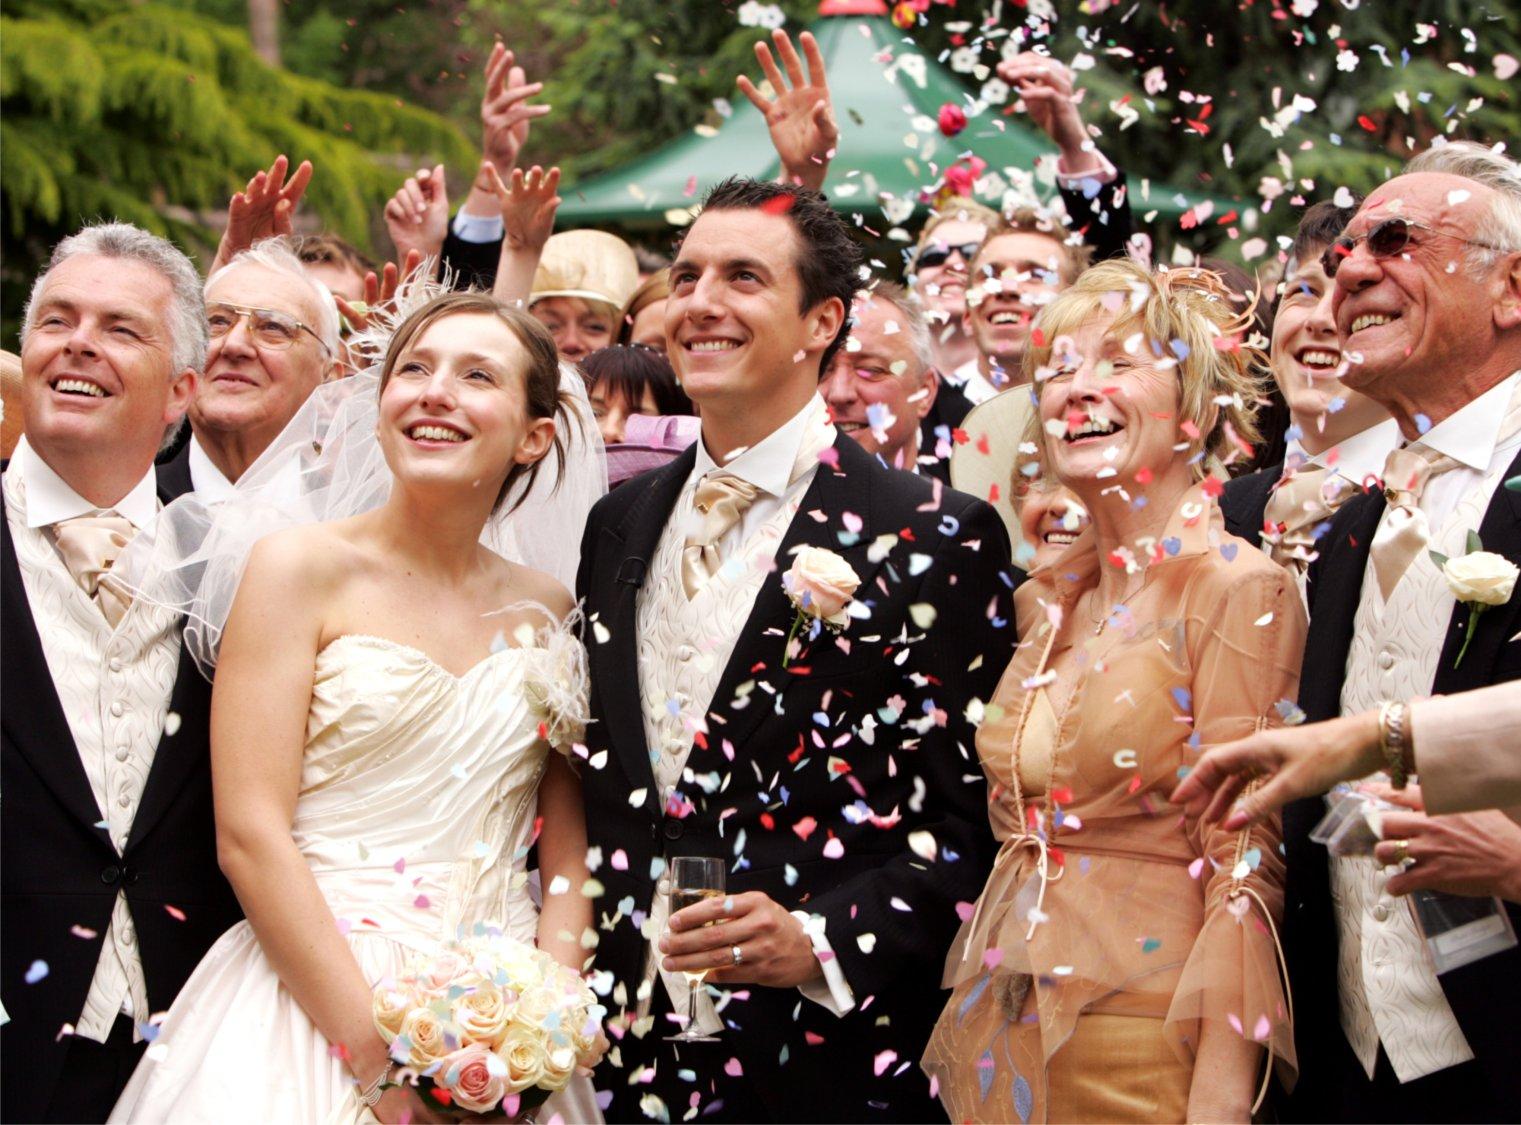 casamento-convidados-bridalcookie_com